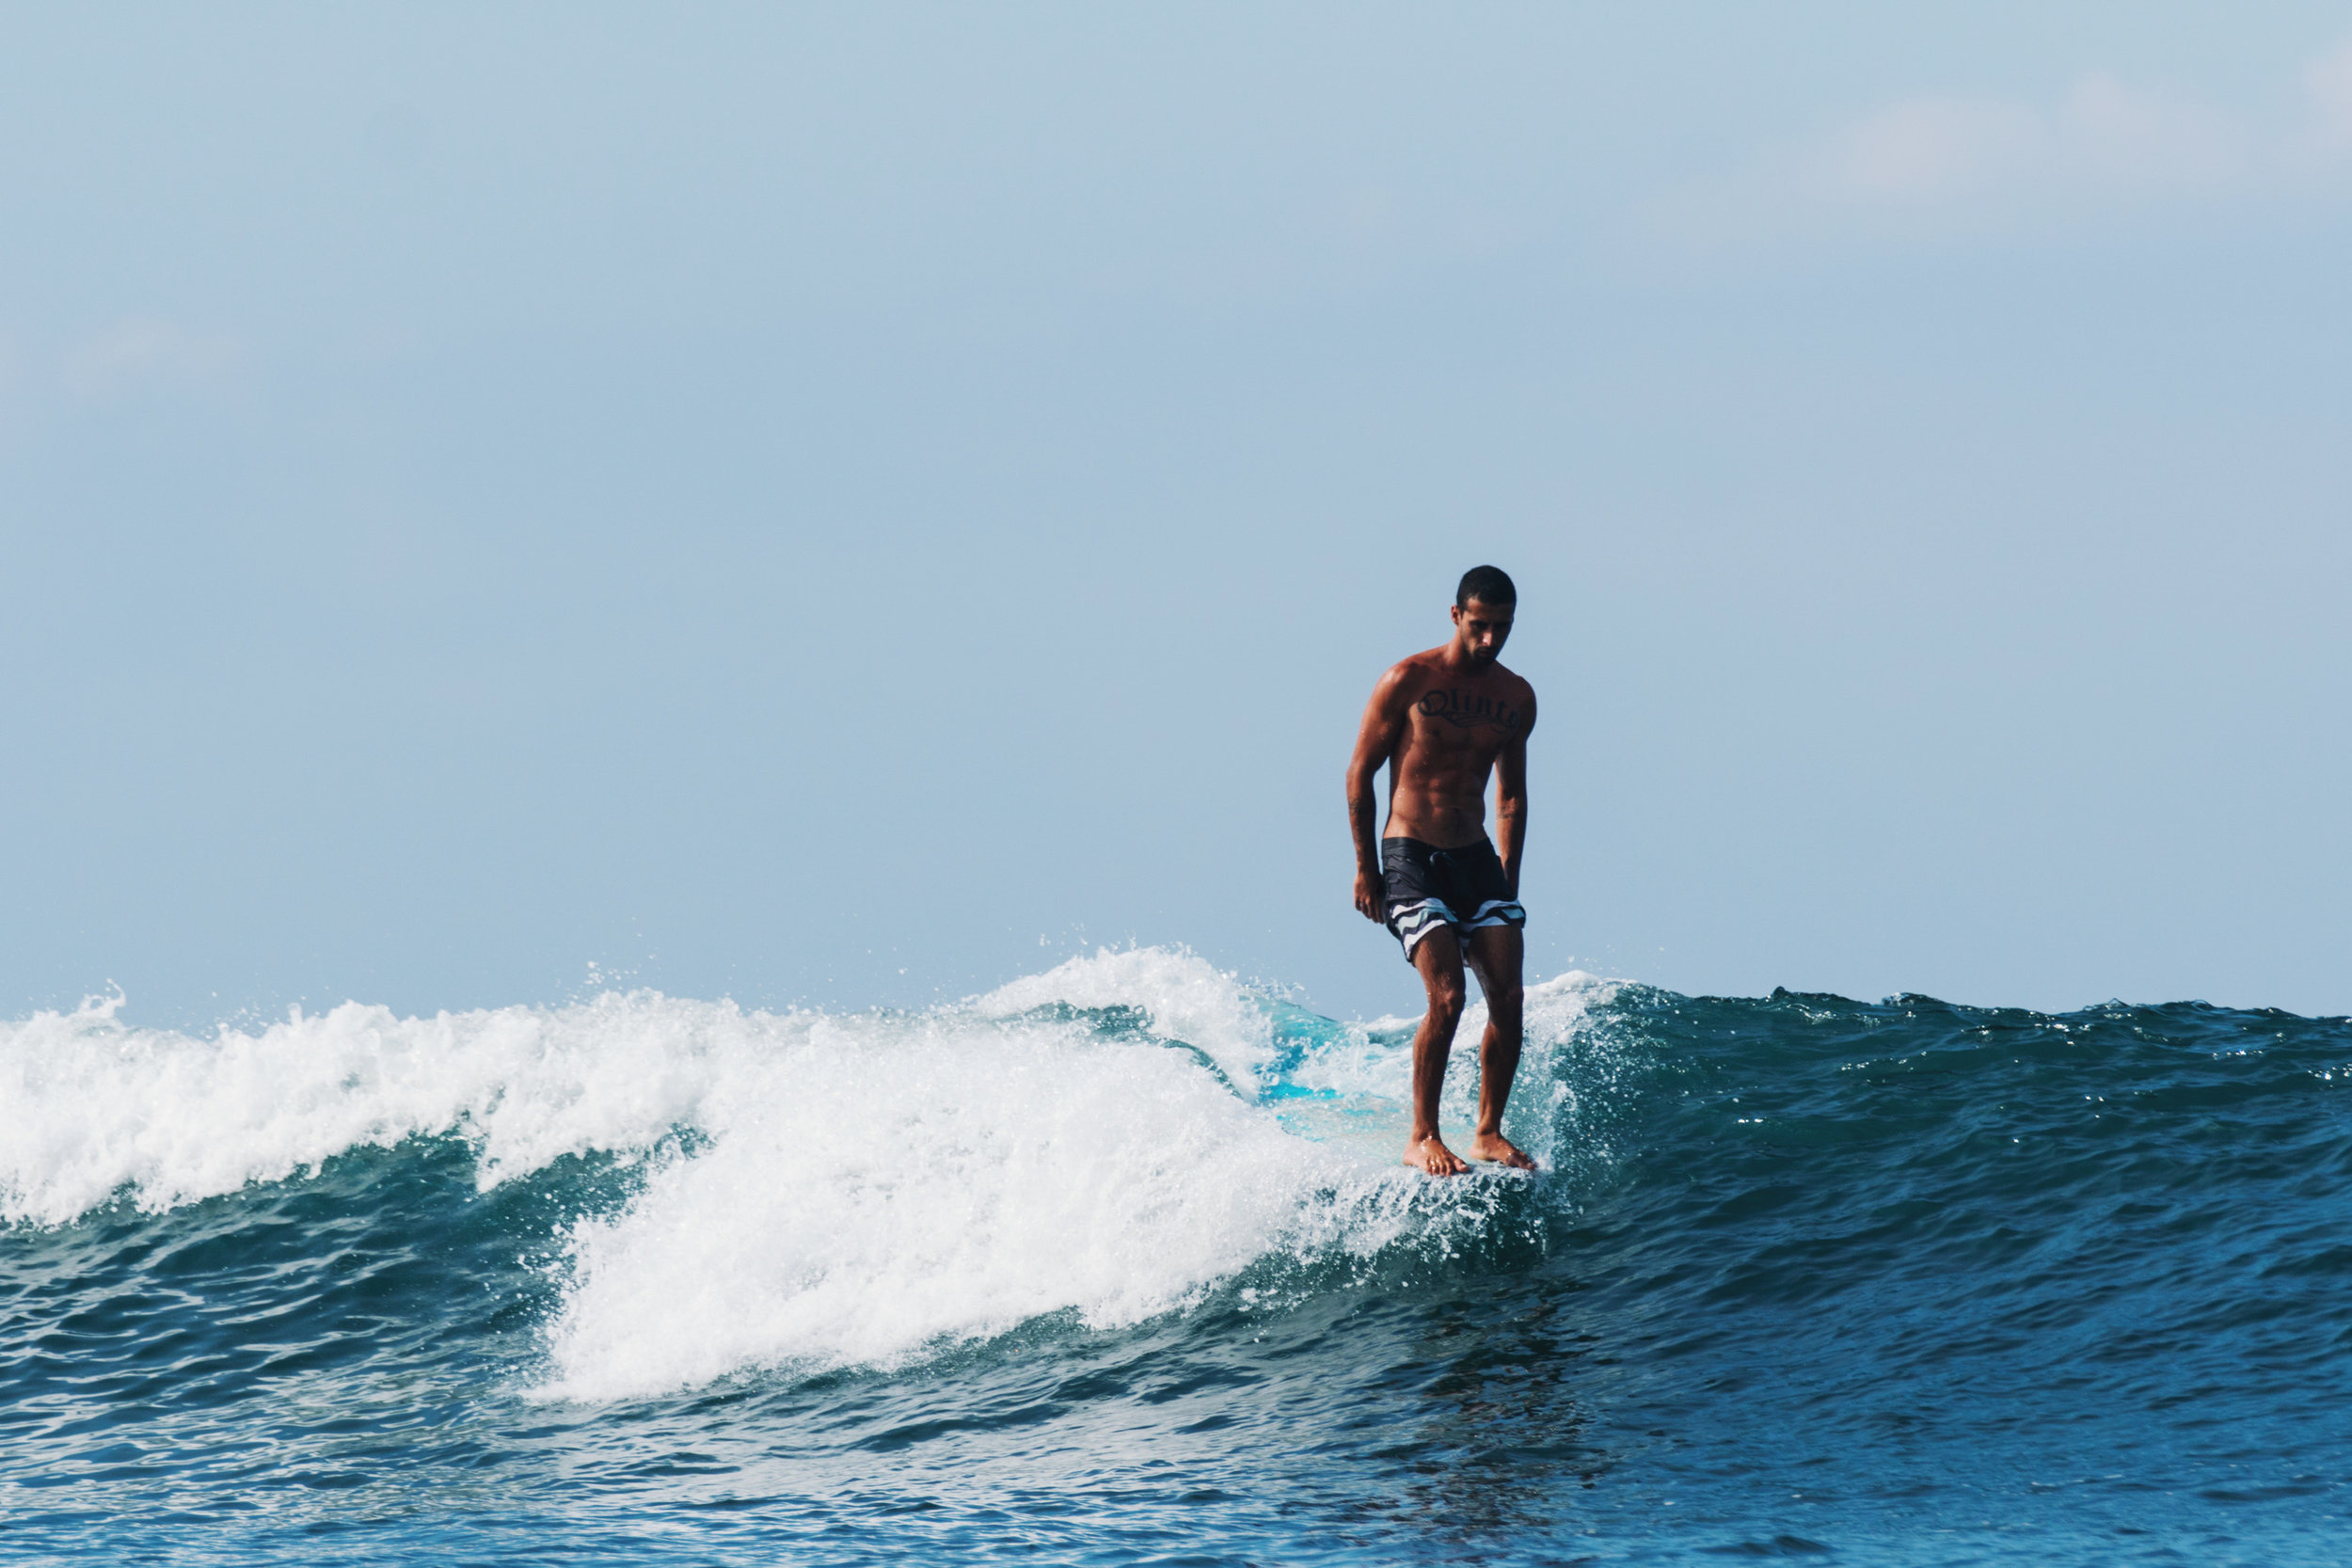 Surf-Mexico-Zihuatanejo-Sayulita-Ixtapa-Zihuatanejo-Diego-Cadena-Olas-Fotografia-Heiko-Bothe-12.jpg